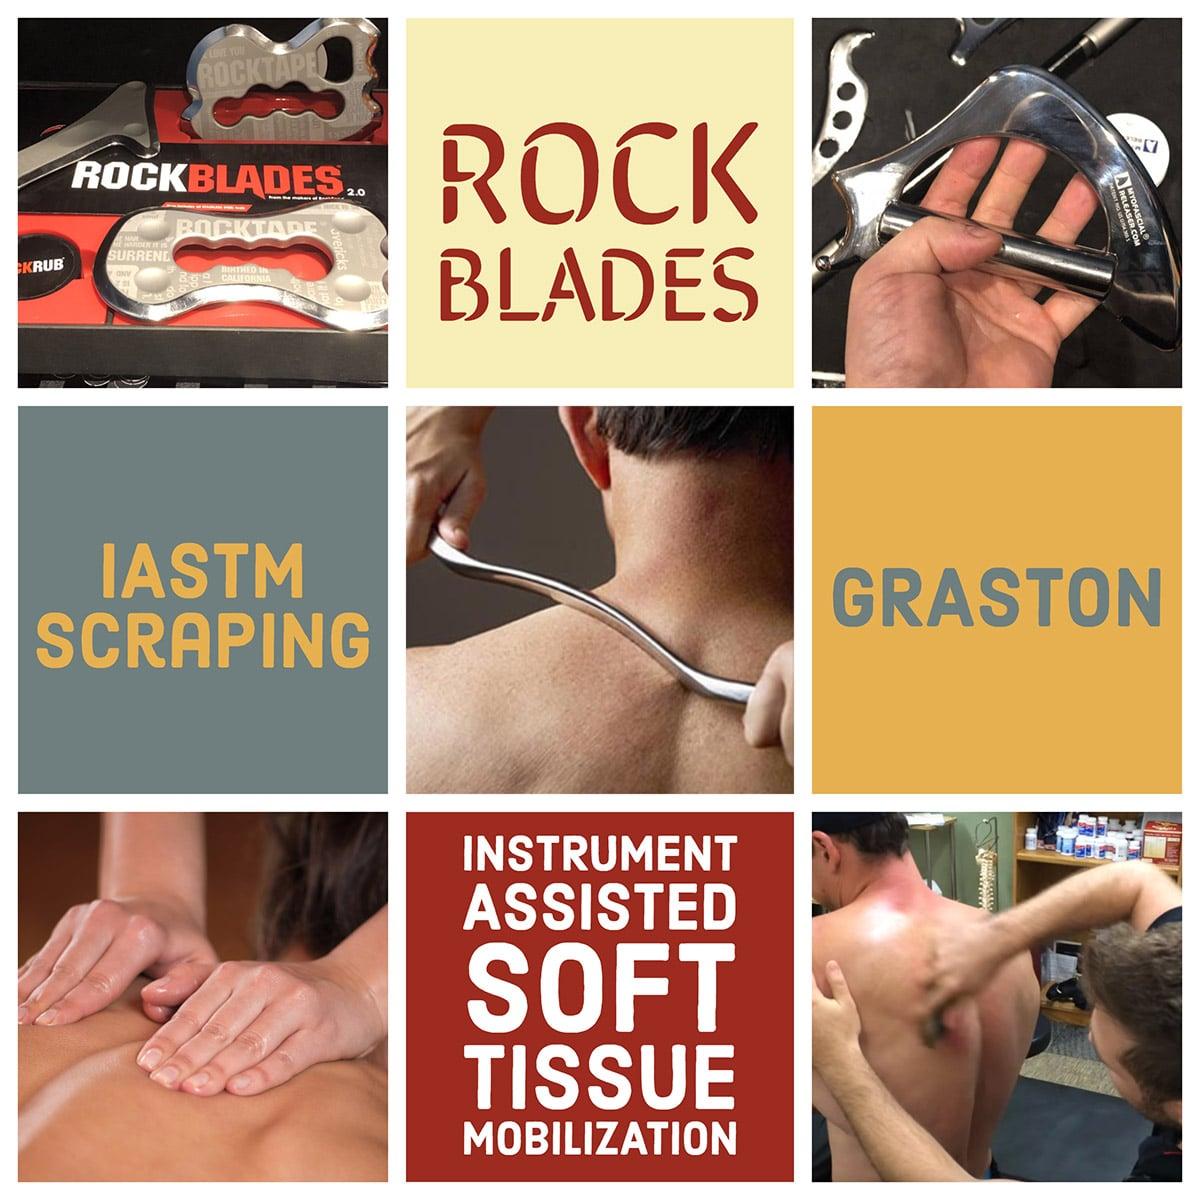 Rock Blades Graston Scraping IASTM